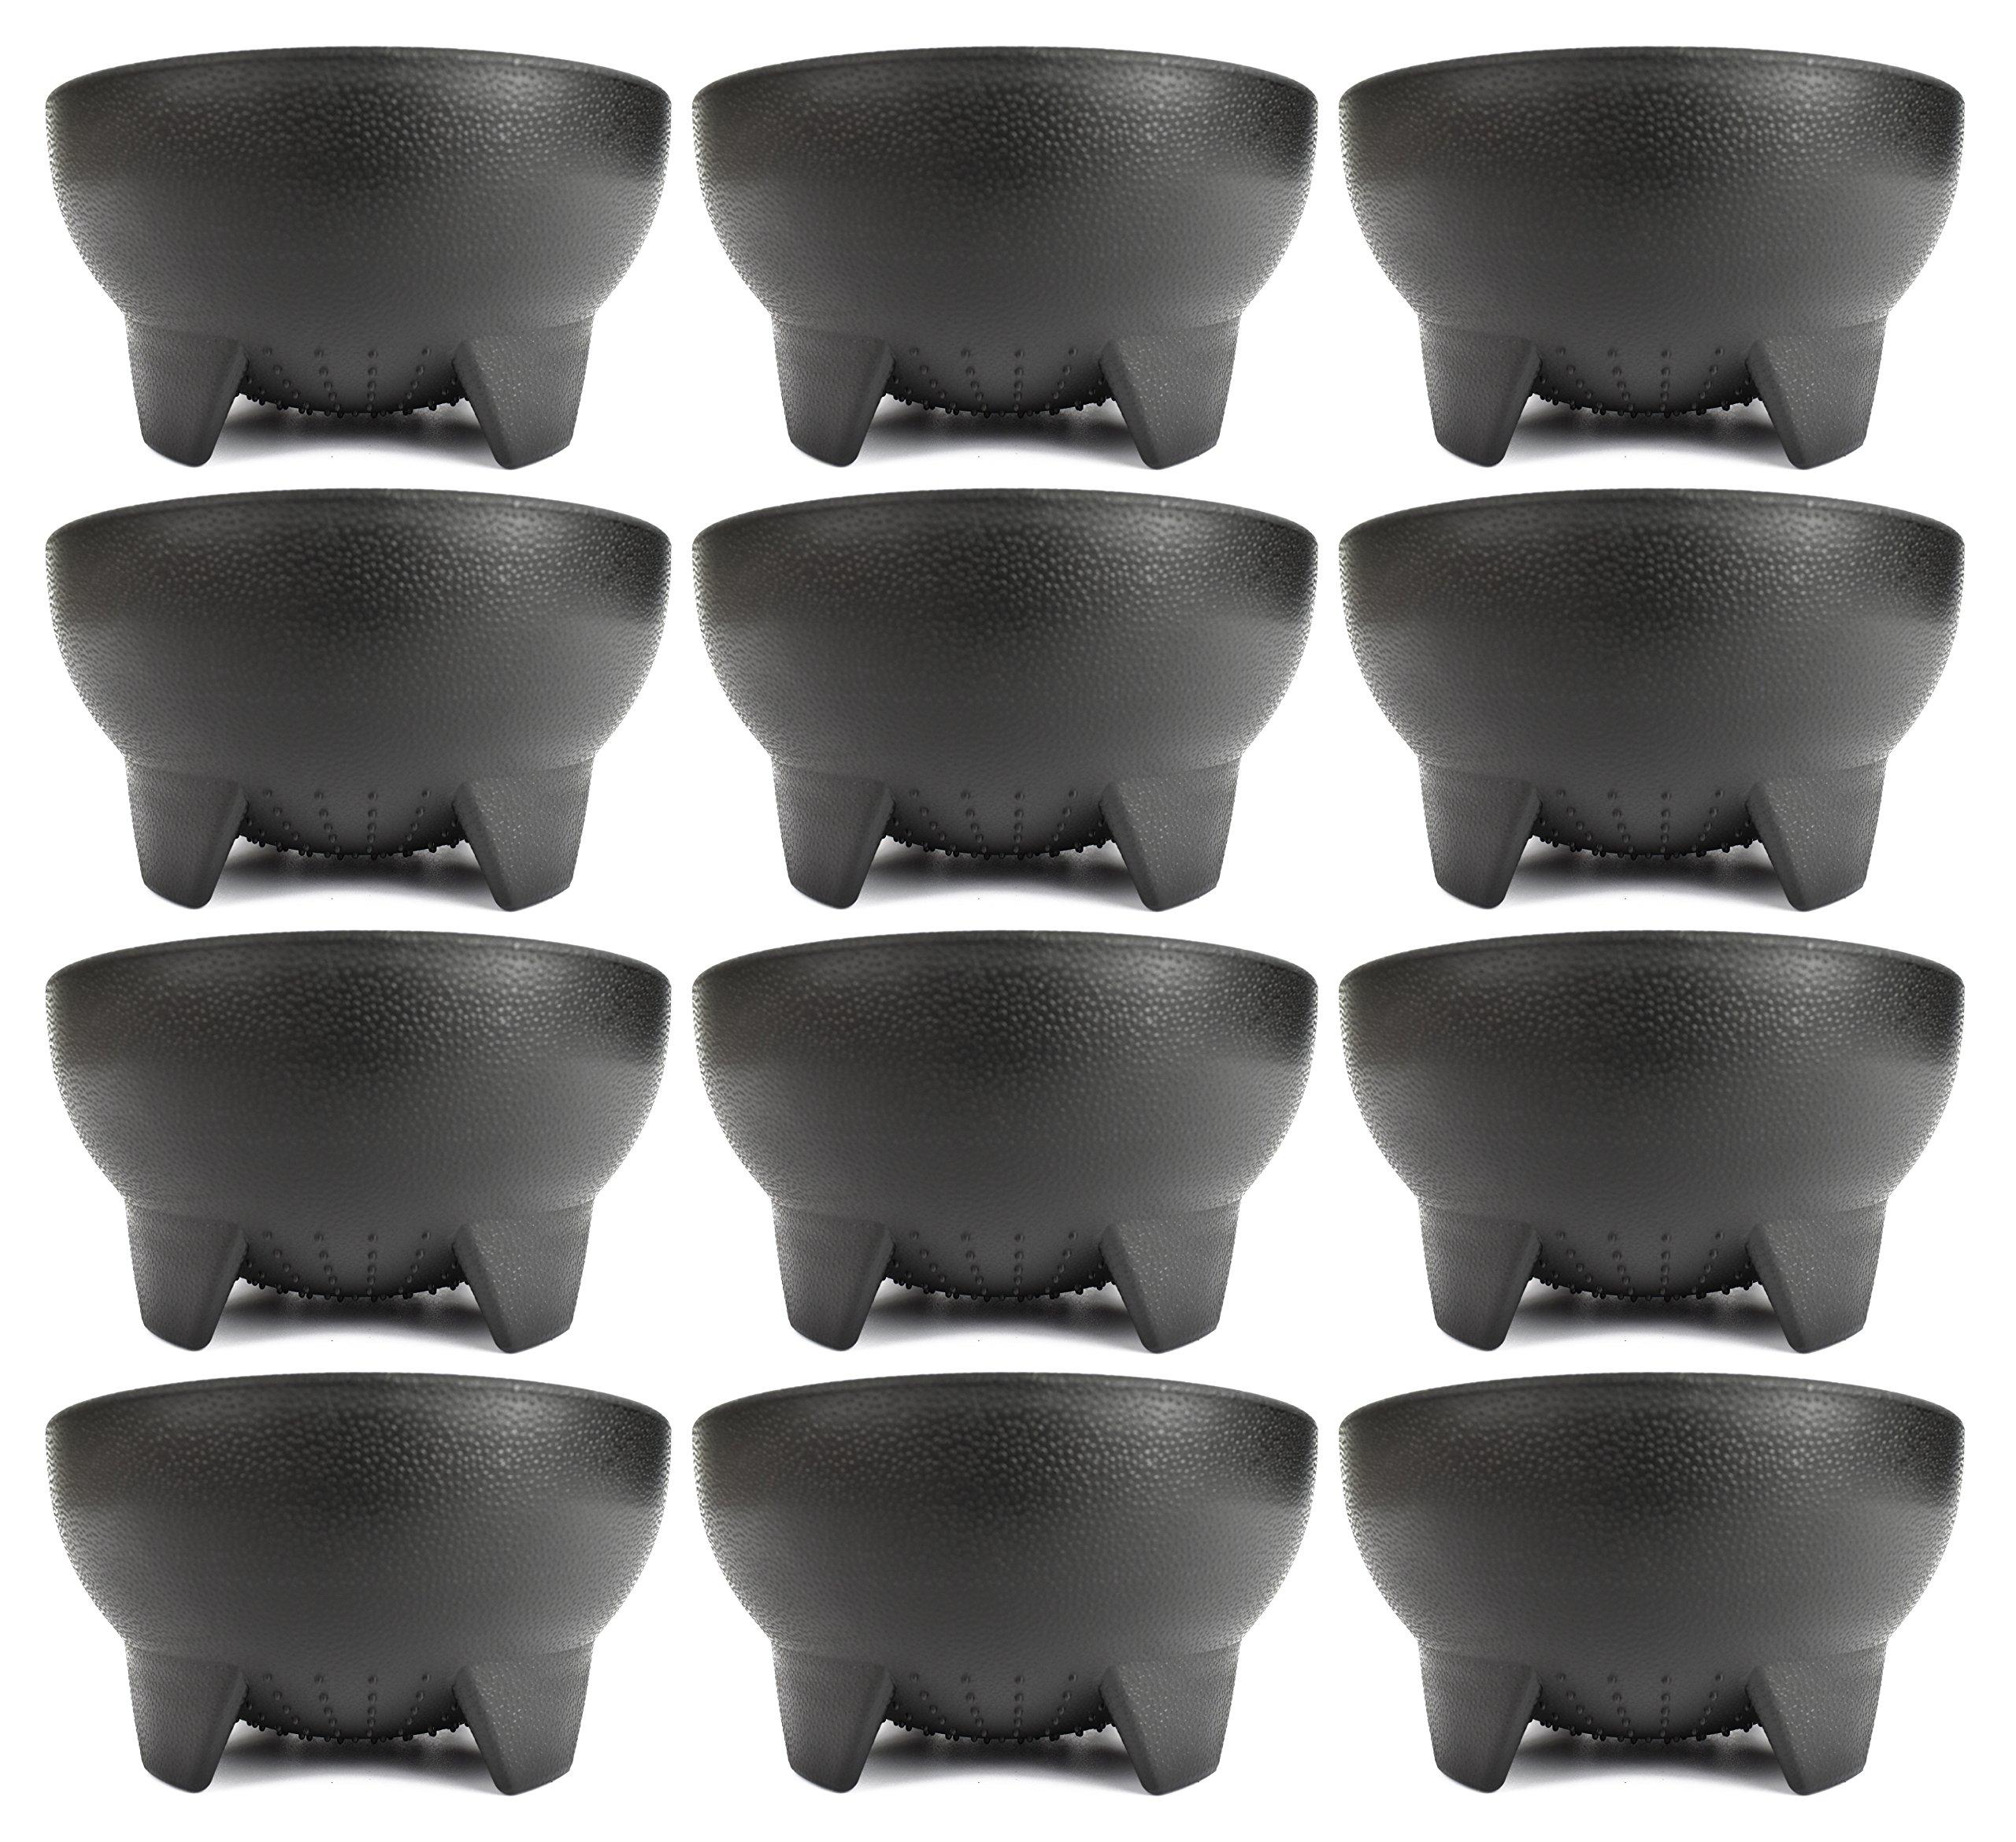 Set of 12 Black Black Duck Brand 4.5'' Diameter Salsa Bowls!